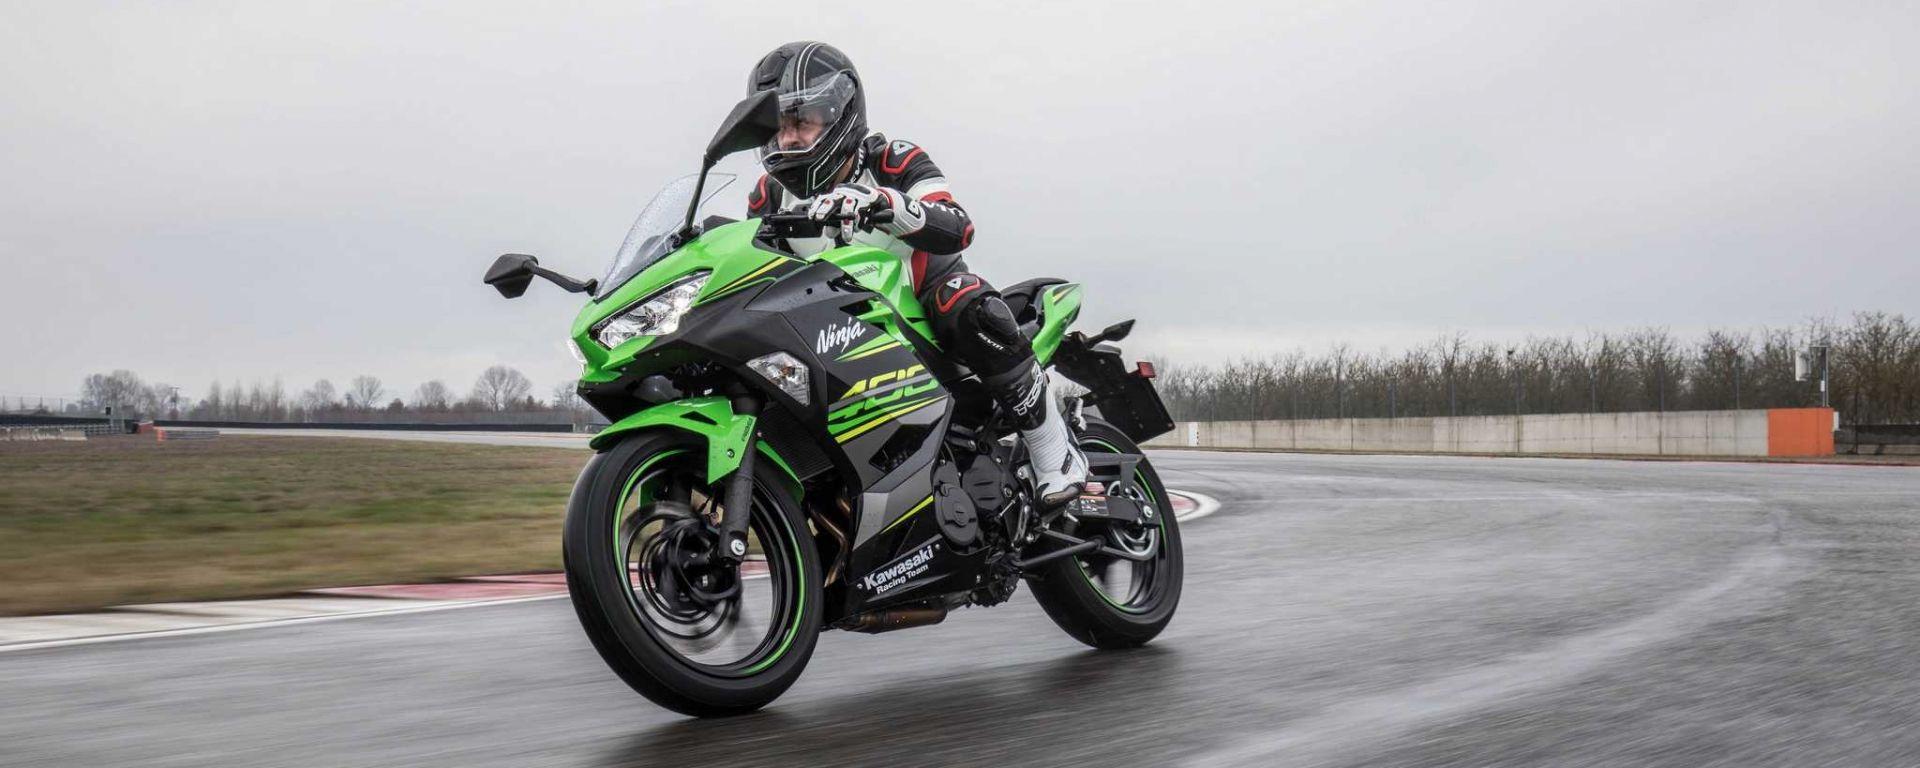 Nuova Kawasaki Ninja 400: prova su strada e in pista